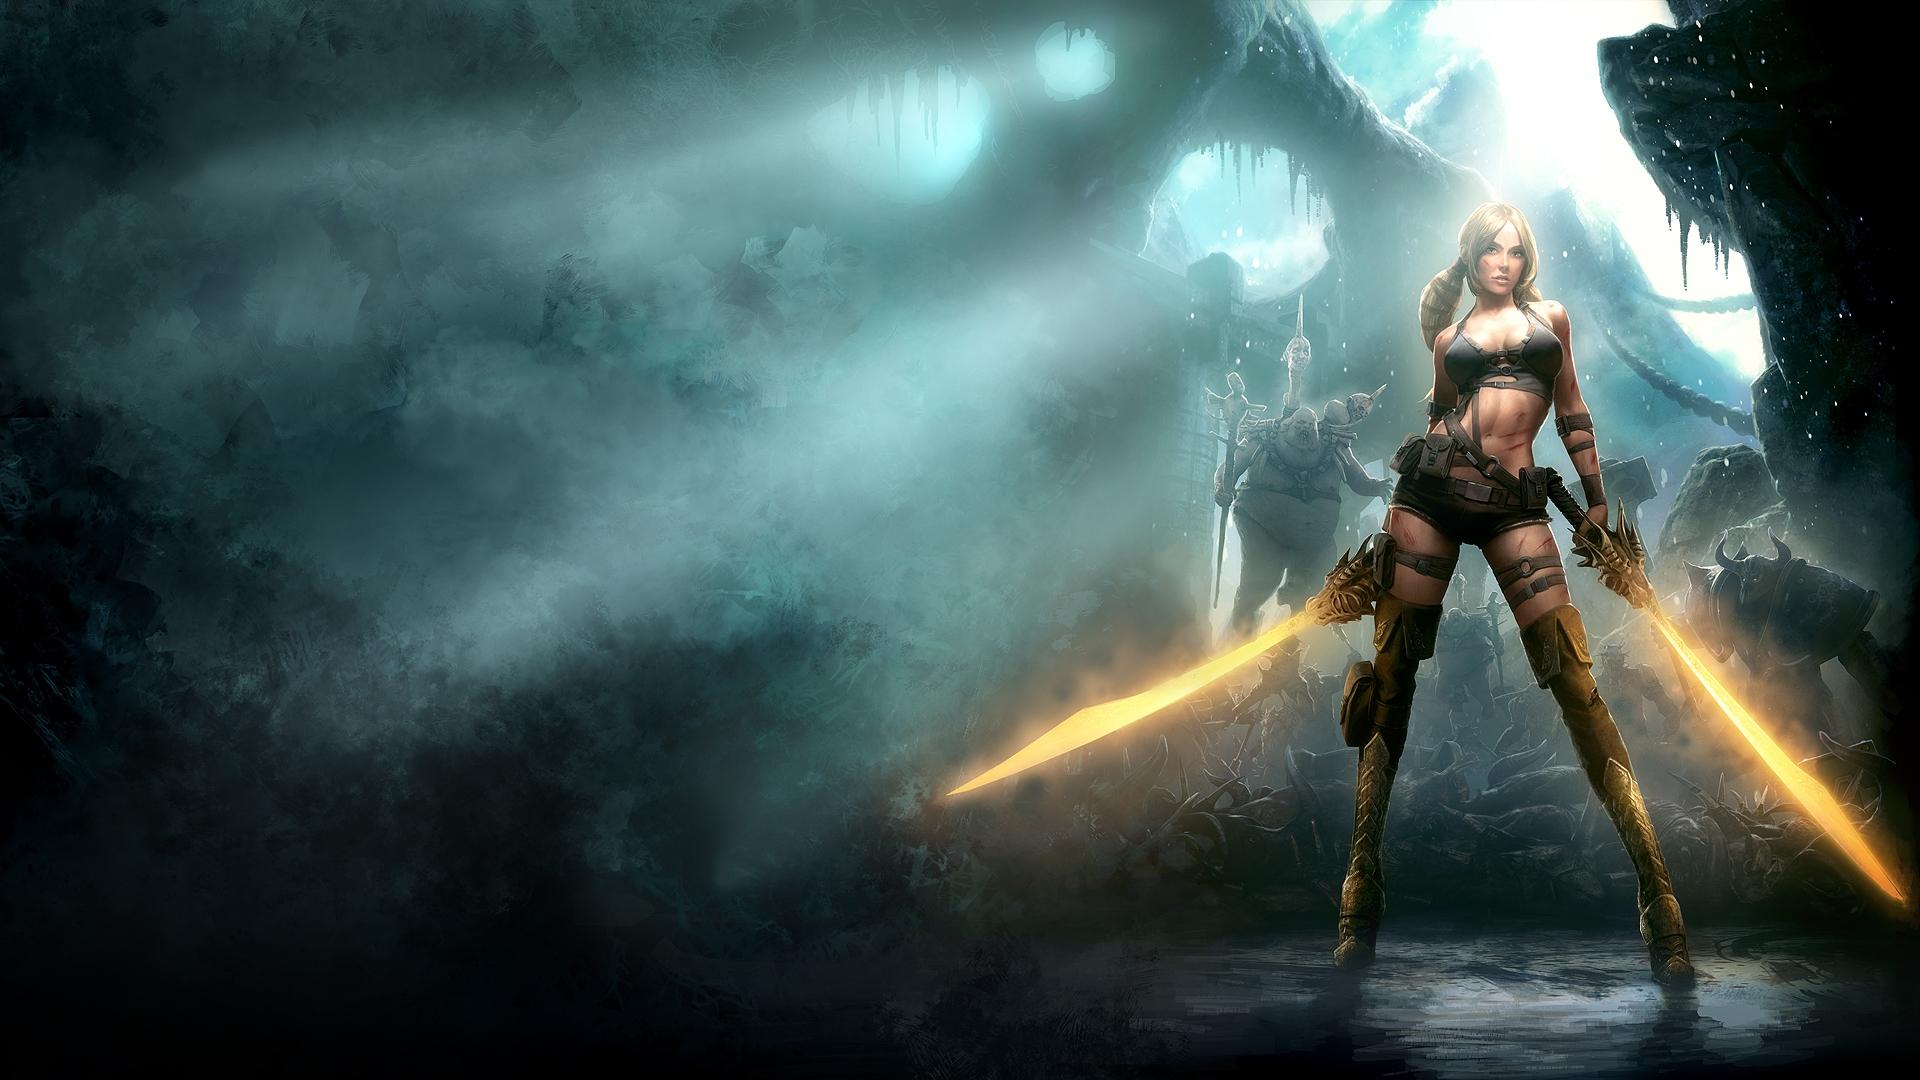 Homepage Fantasy Fantasy HD wallpaper 1920x1080 205 1920x1080